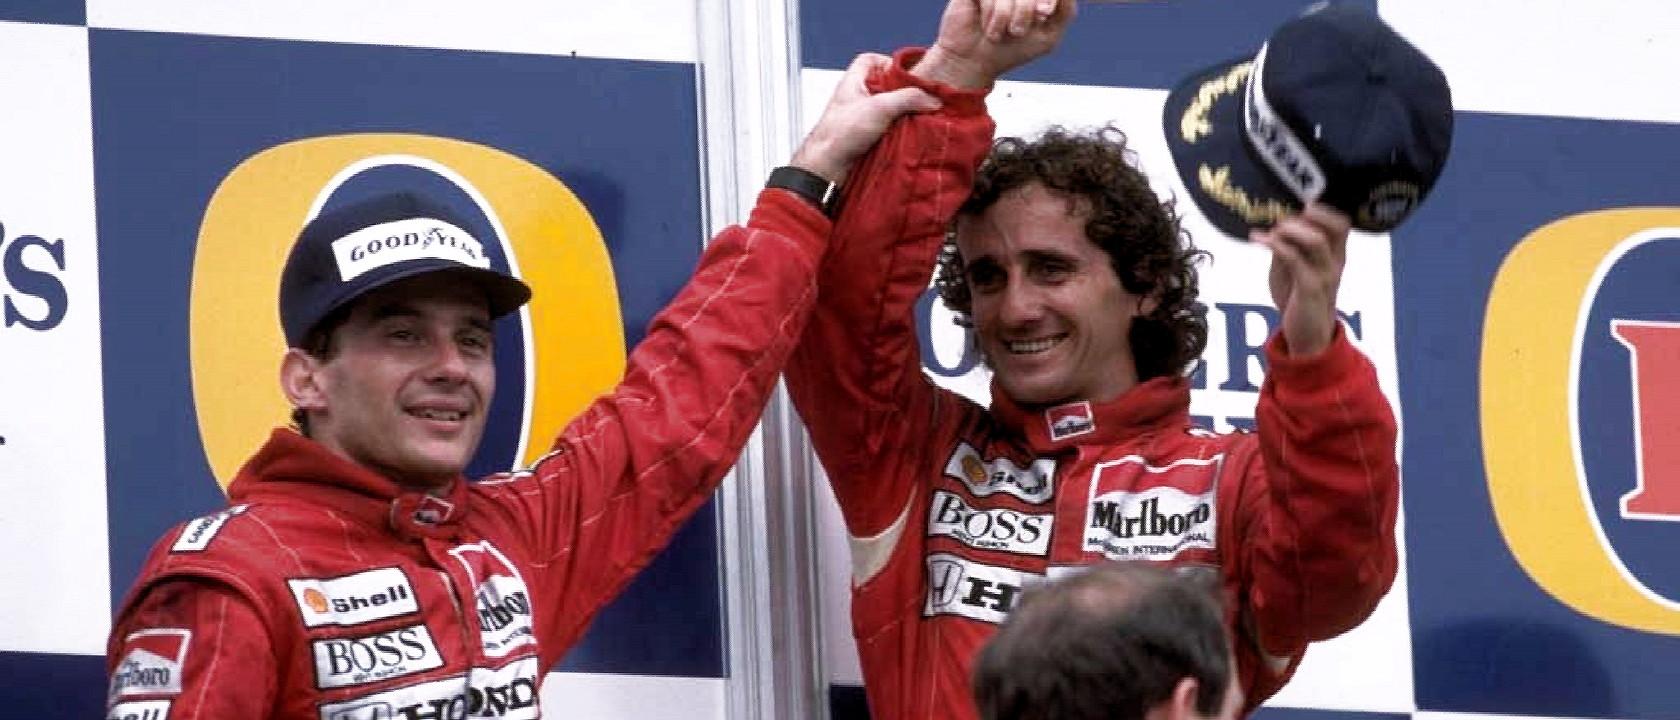 australia_1988_podium-1680x720